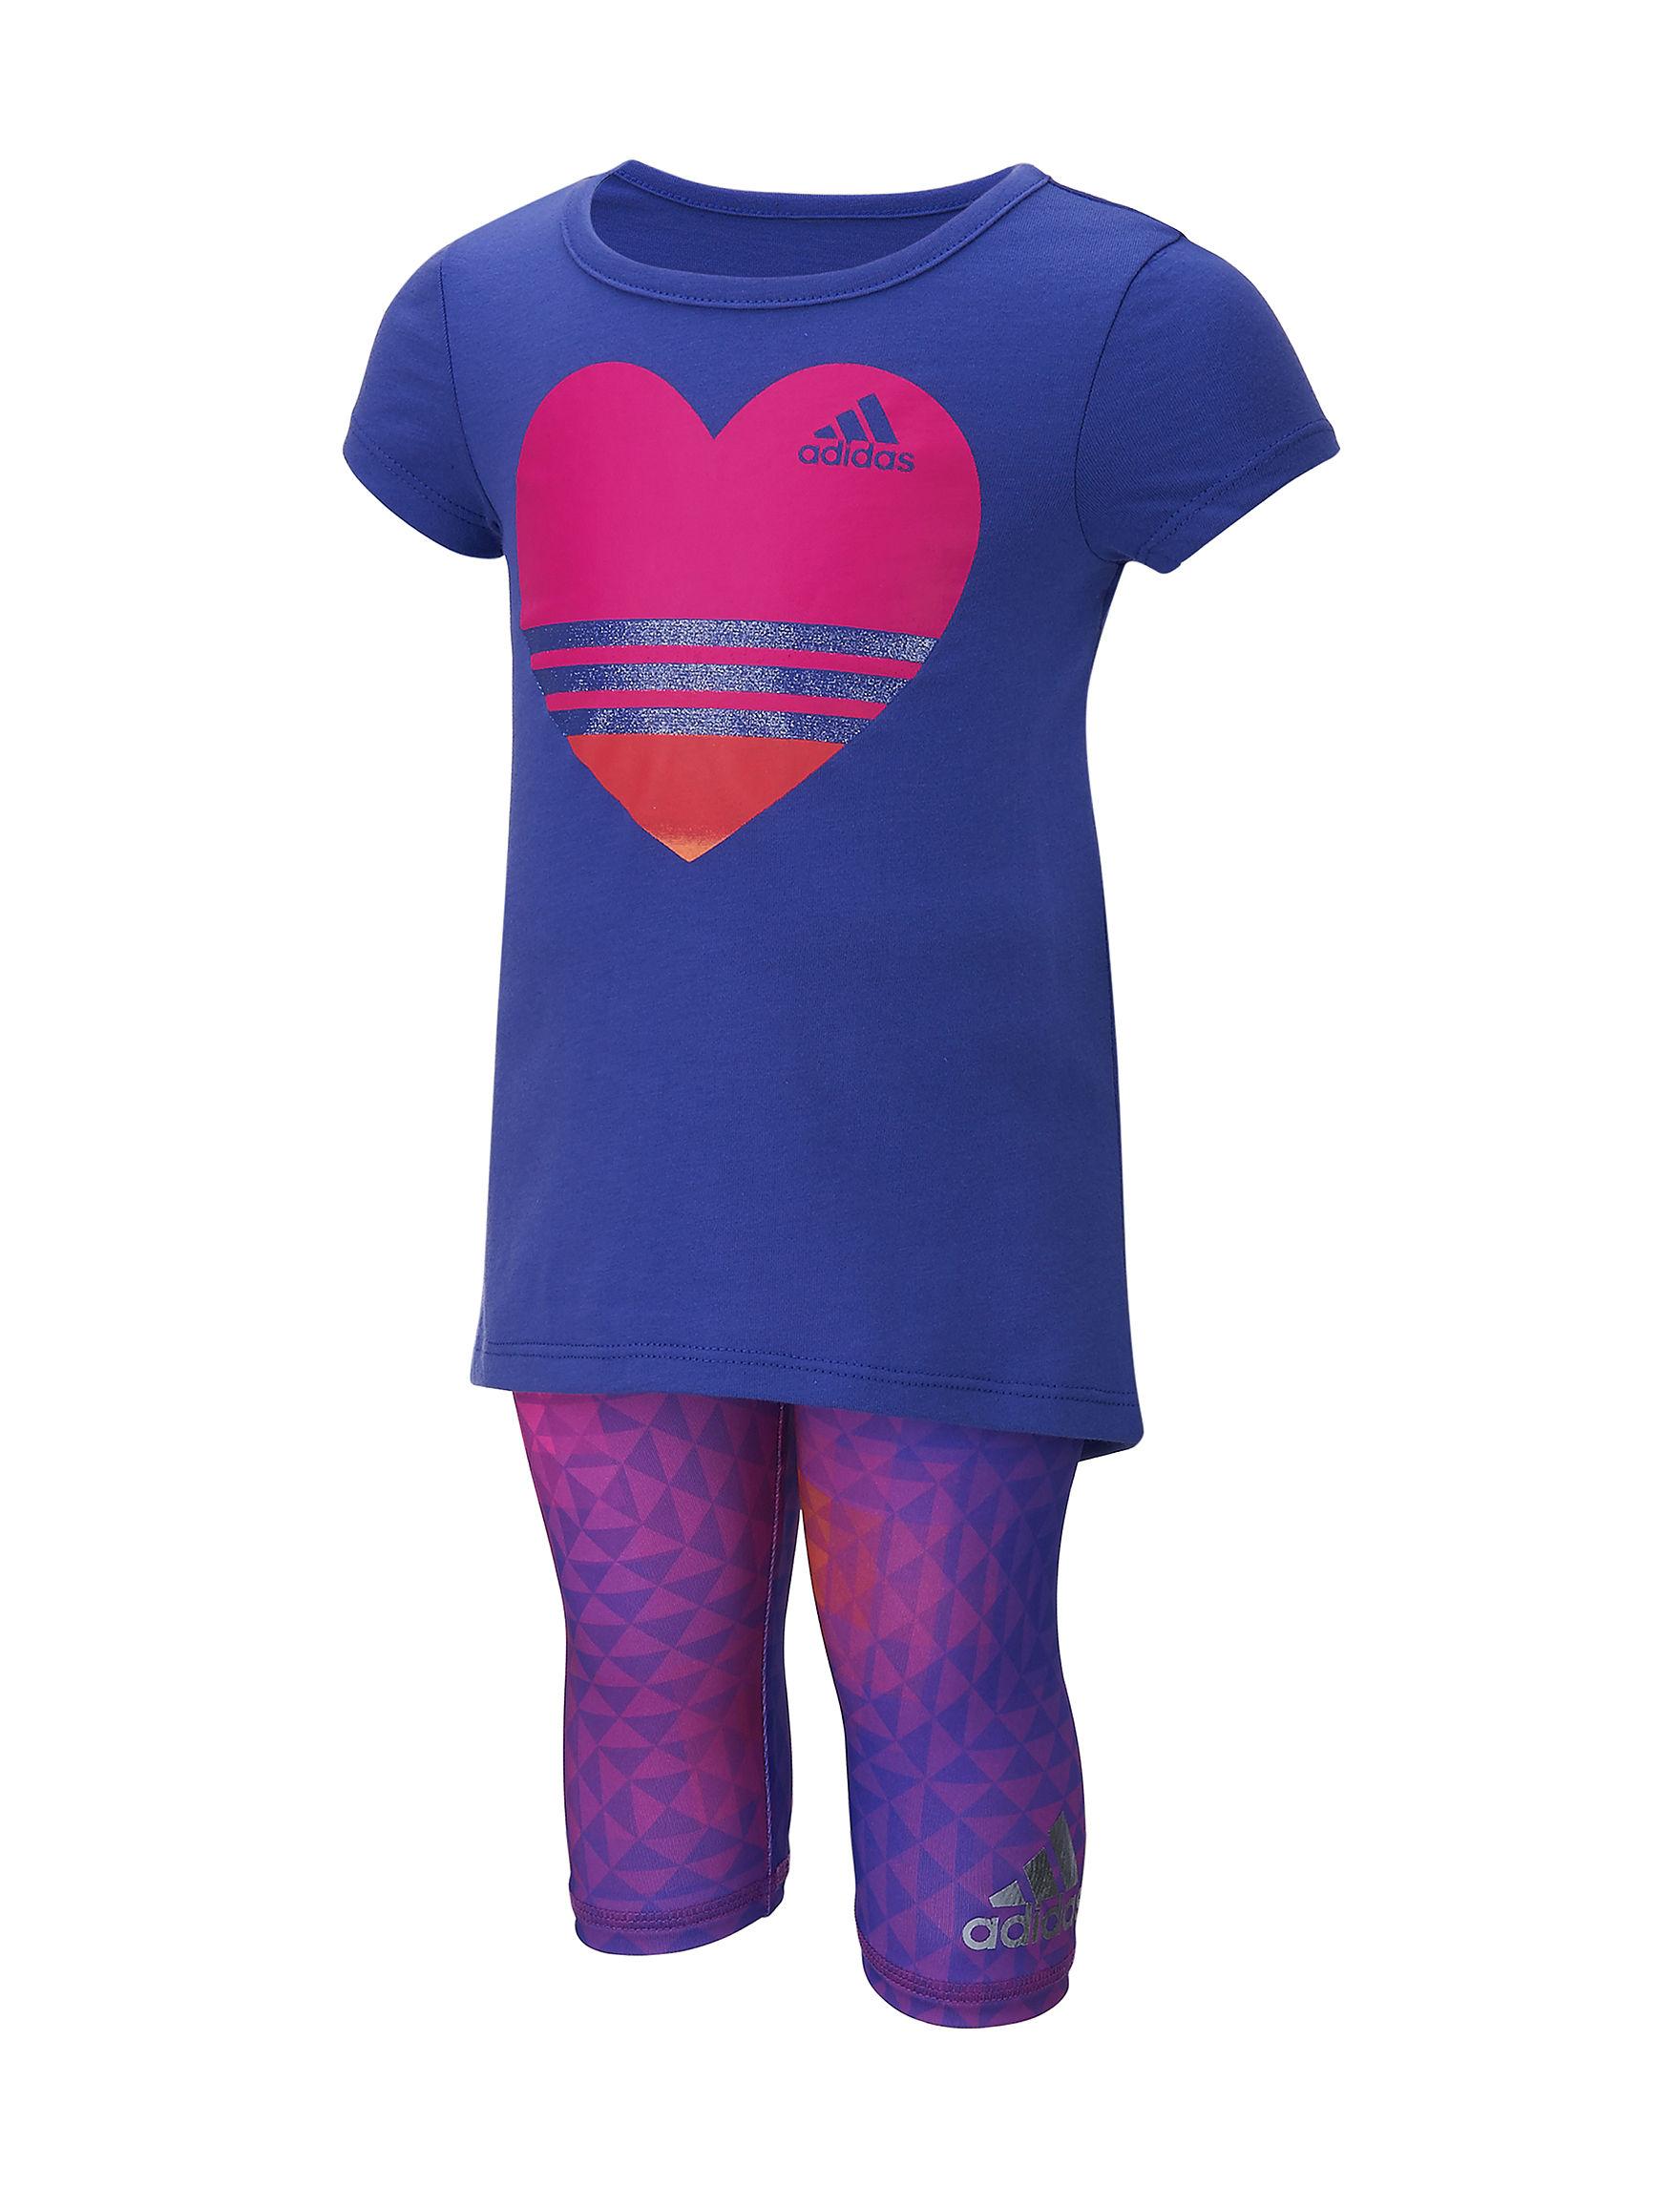 Adidas Purple